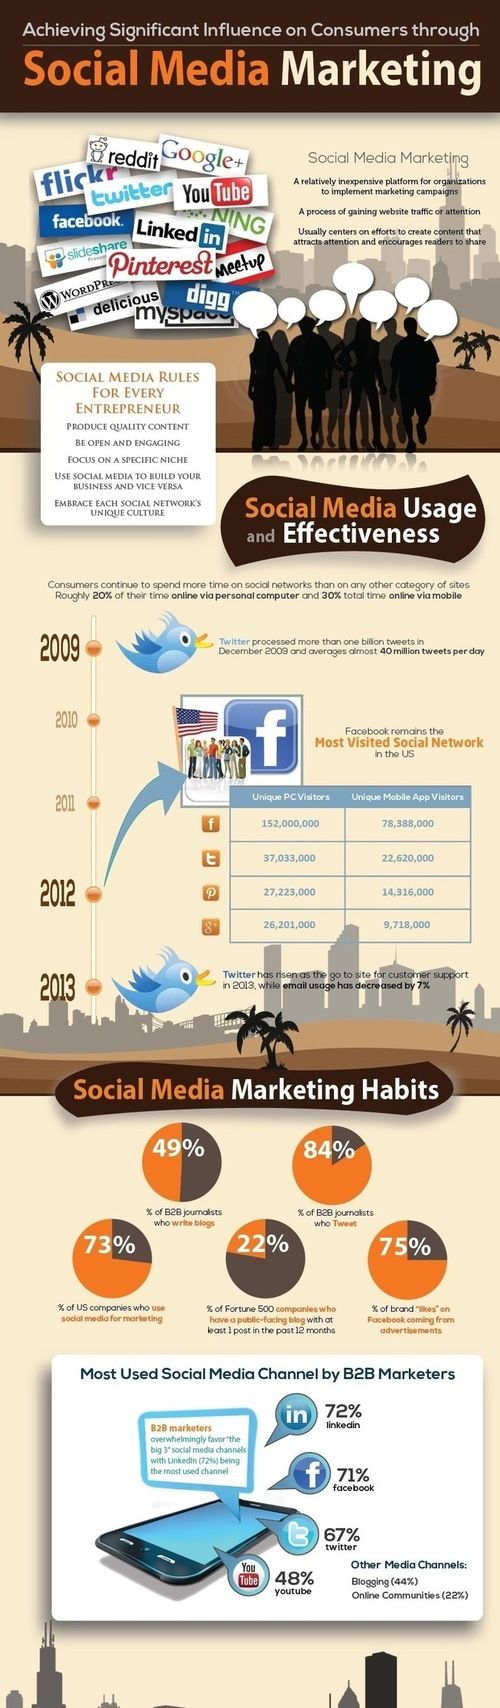 "SOCIAL MEDIA -         Achieving Influence Through #SocialMediaMarketing – Infographic – Wikimotive"". #smm"